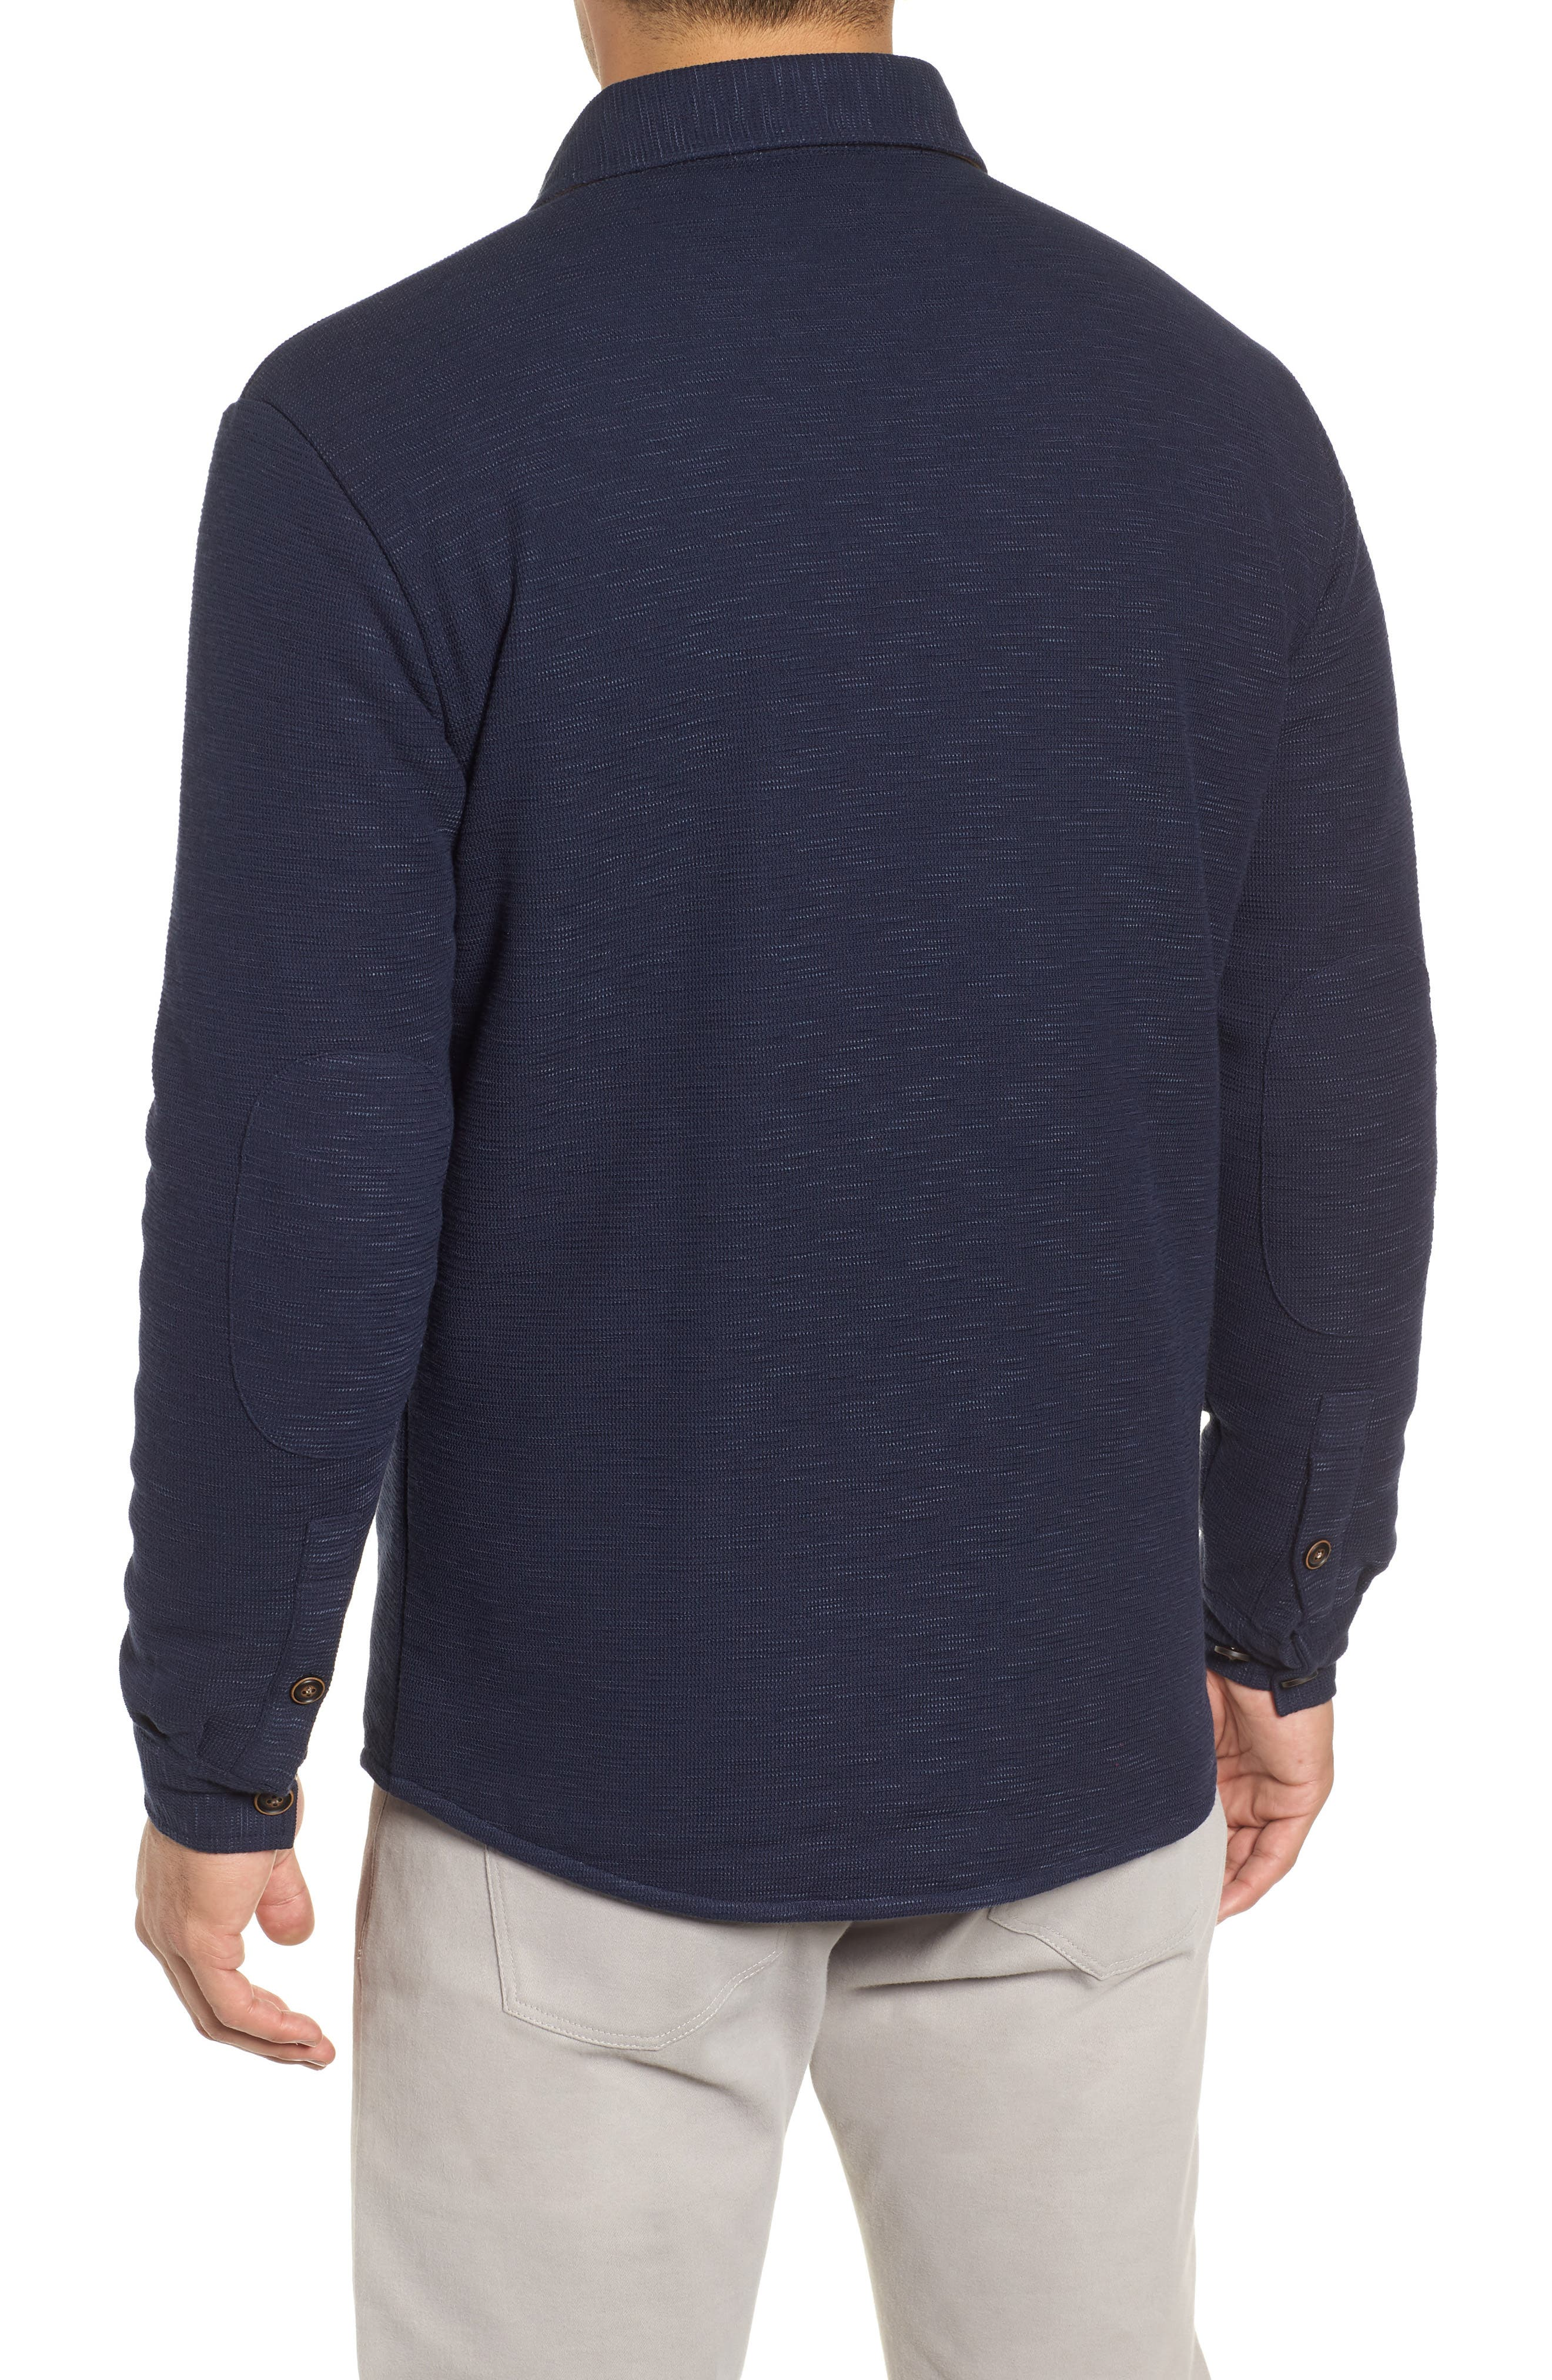 PETER MILLAR,                             Mountainside Shirt Jacket,                             Alternate thumbnail 2, color,                             ATLANTIC BLUE